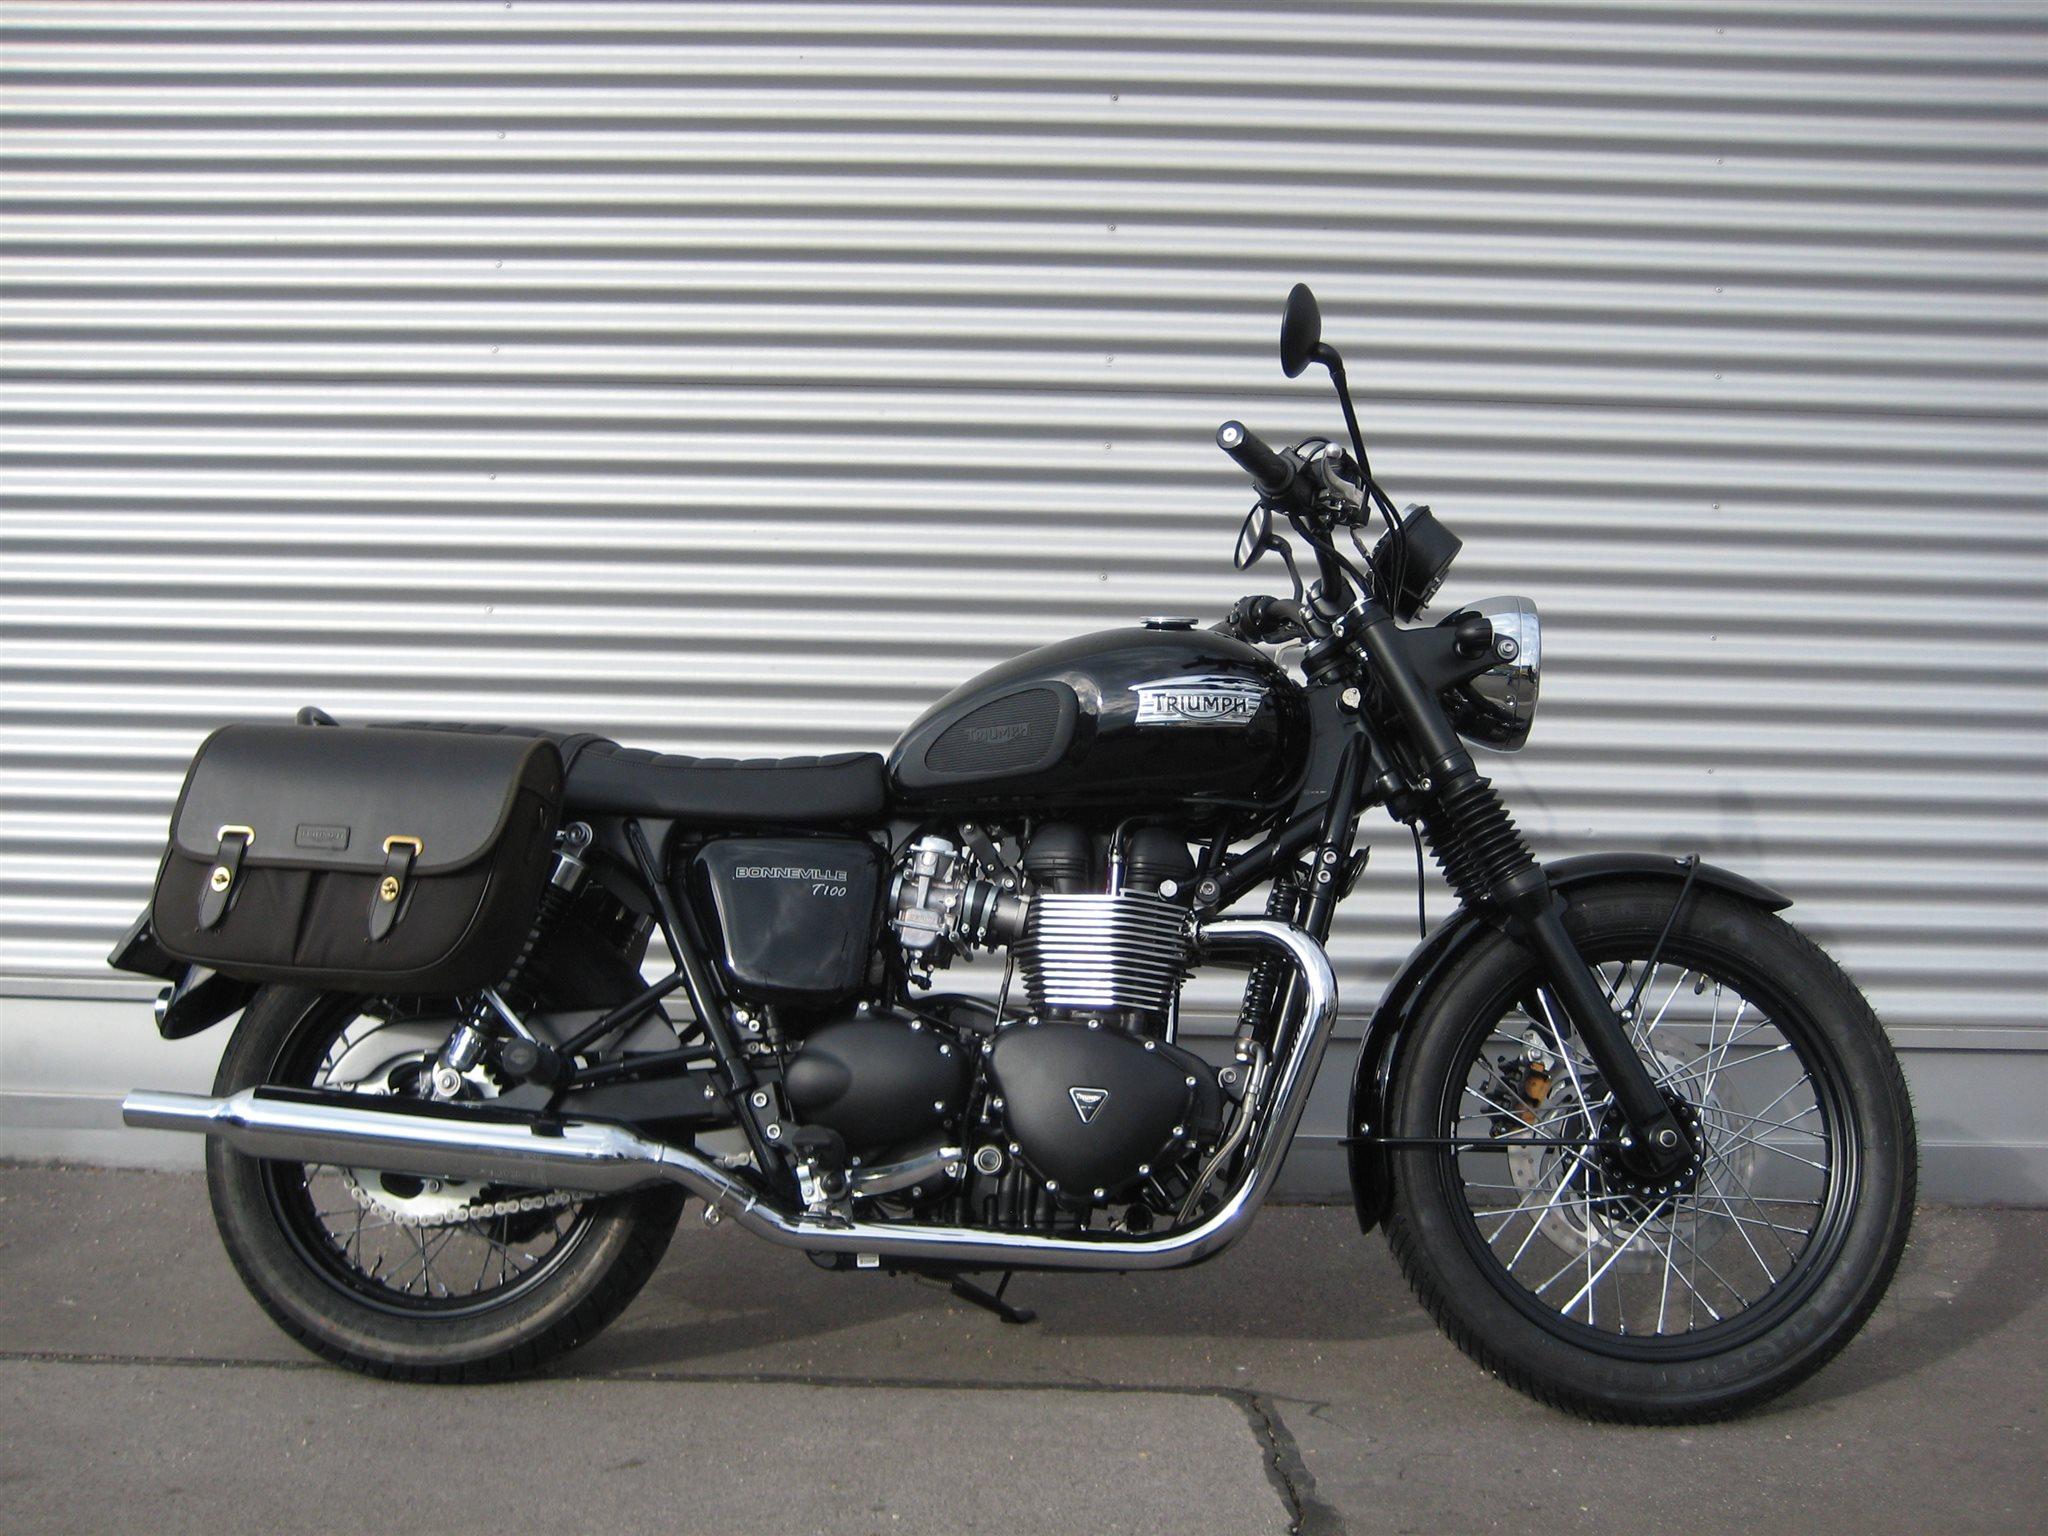 umgebautes motorrad triumph bonneville t100 black von il. Black Bedroom Furniture Sets. Home Design Ideas